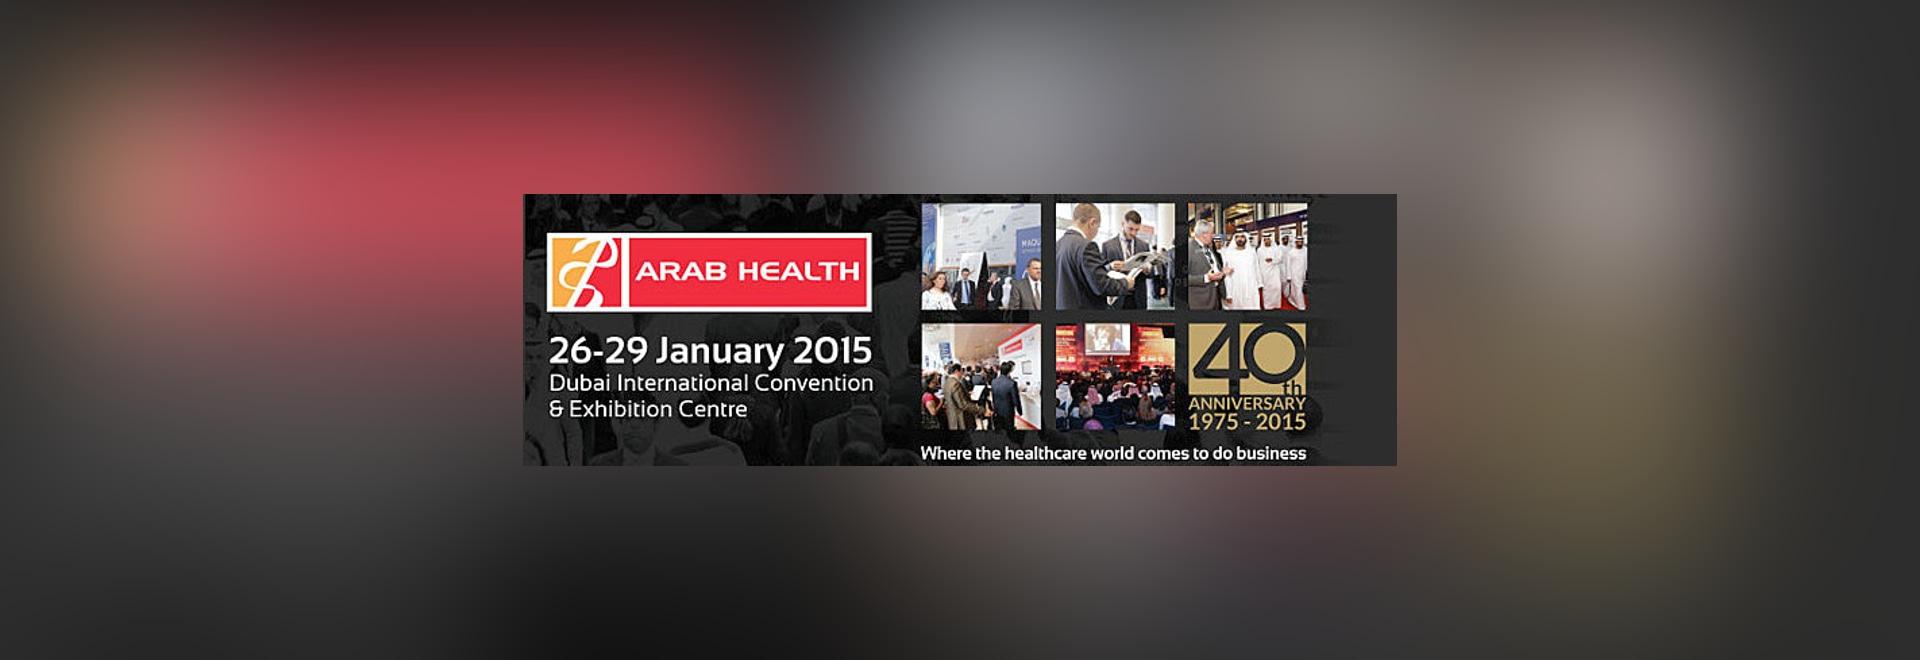 Meet us at ArabHealth Exhibition 26-29 january 2015!